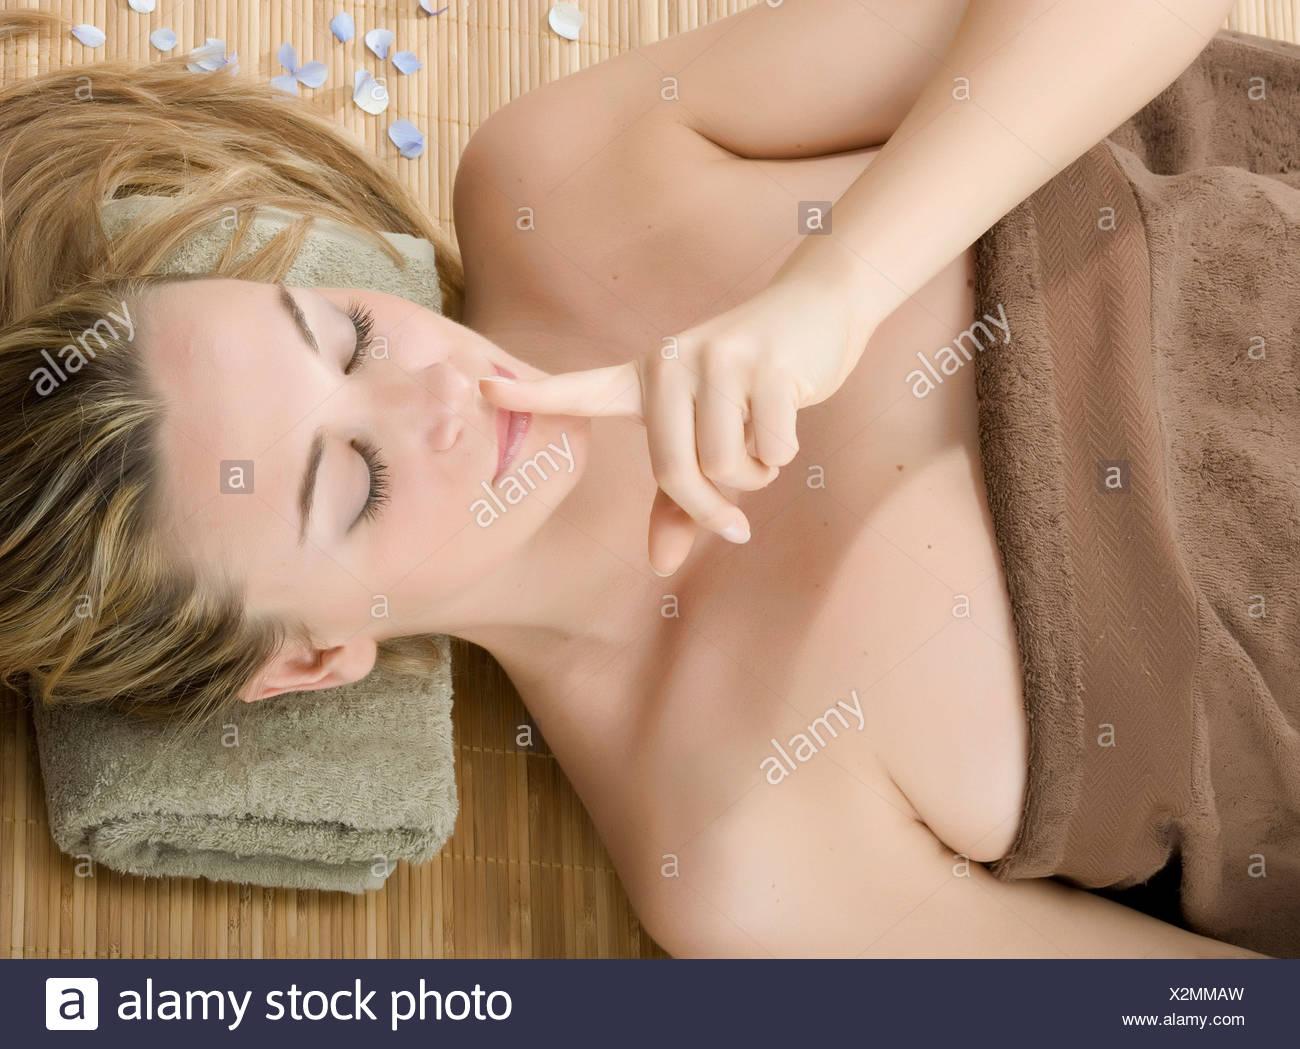 Frau im Spa mit Finger auf die Lippen Stockbild